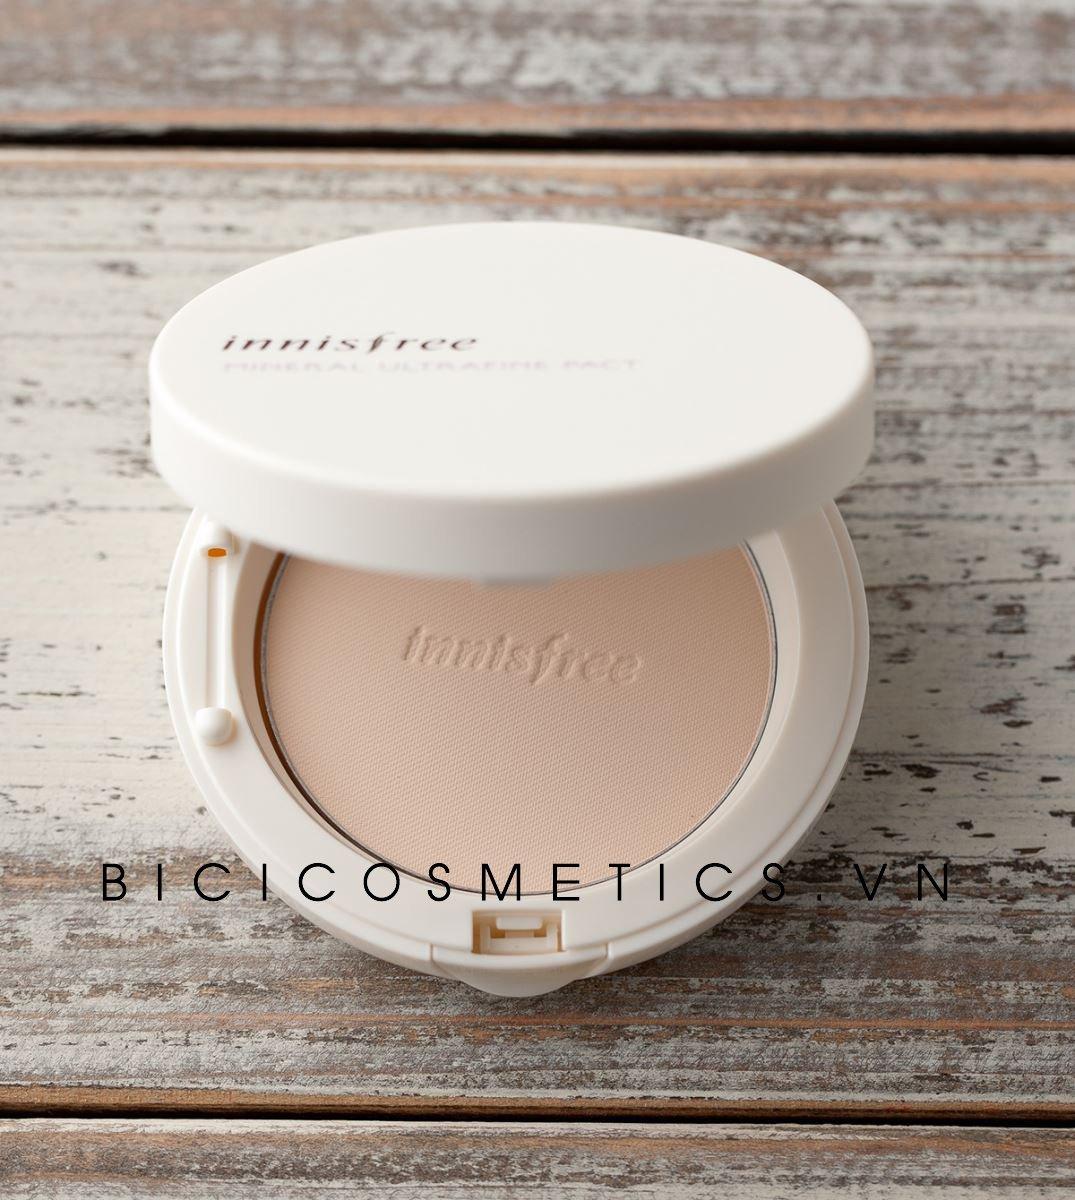 Innisfree Mineral UV Whitening Pact 3- Bici Cosmetics